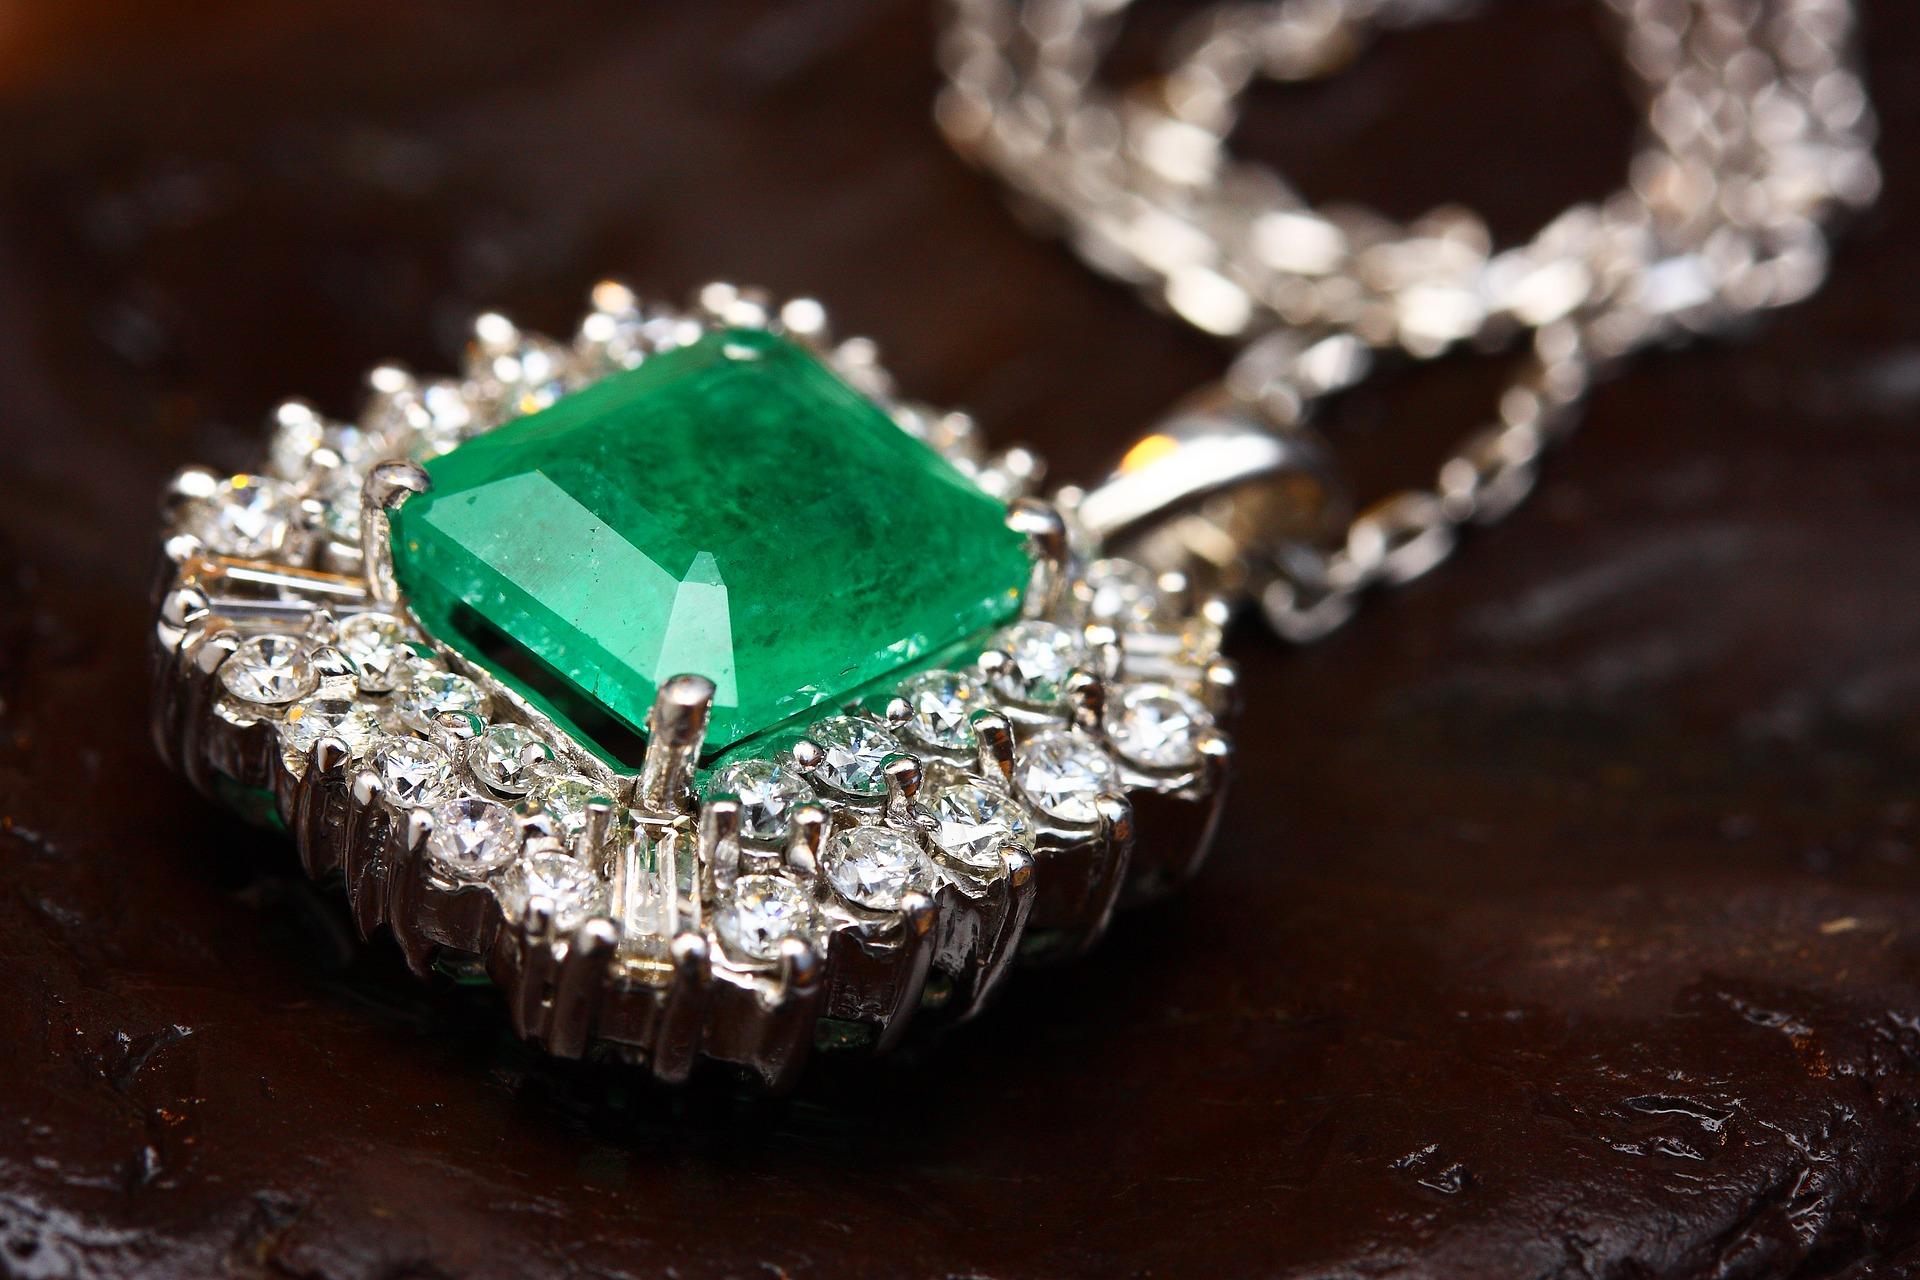 necklace-2405165_1920.jpg